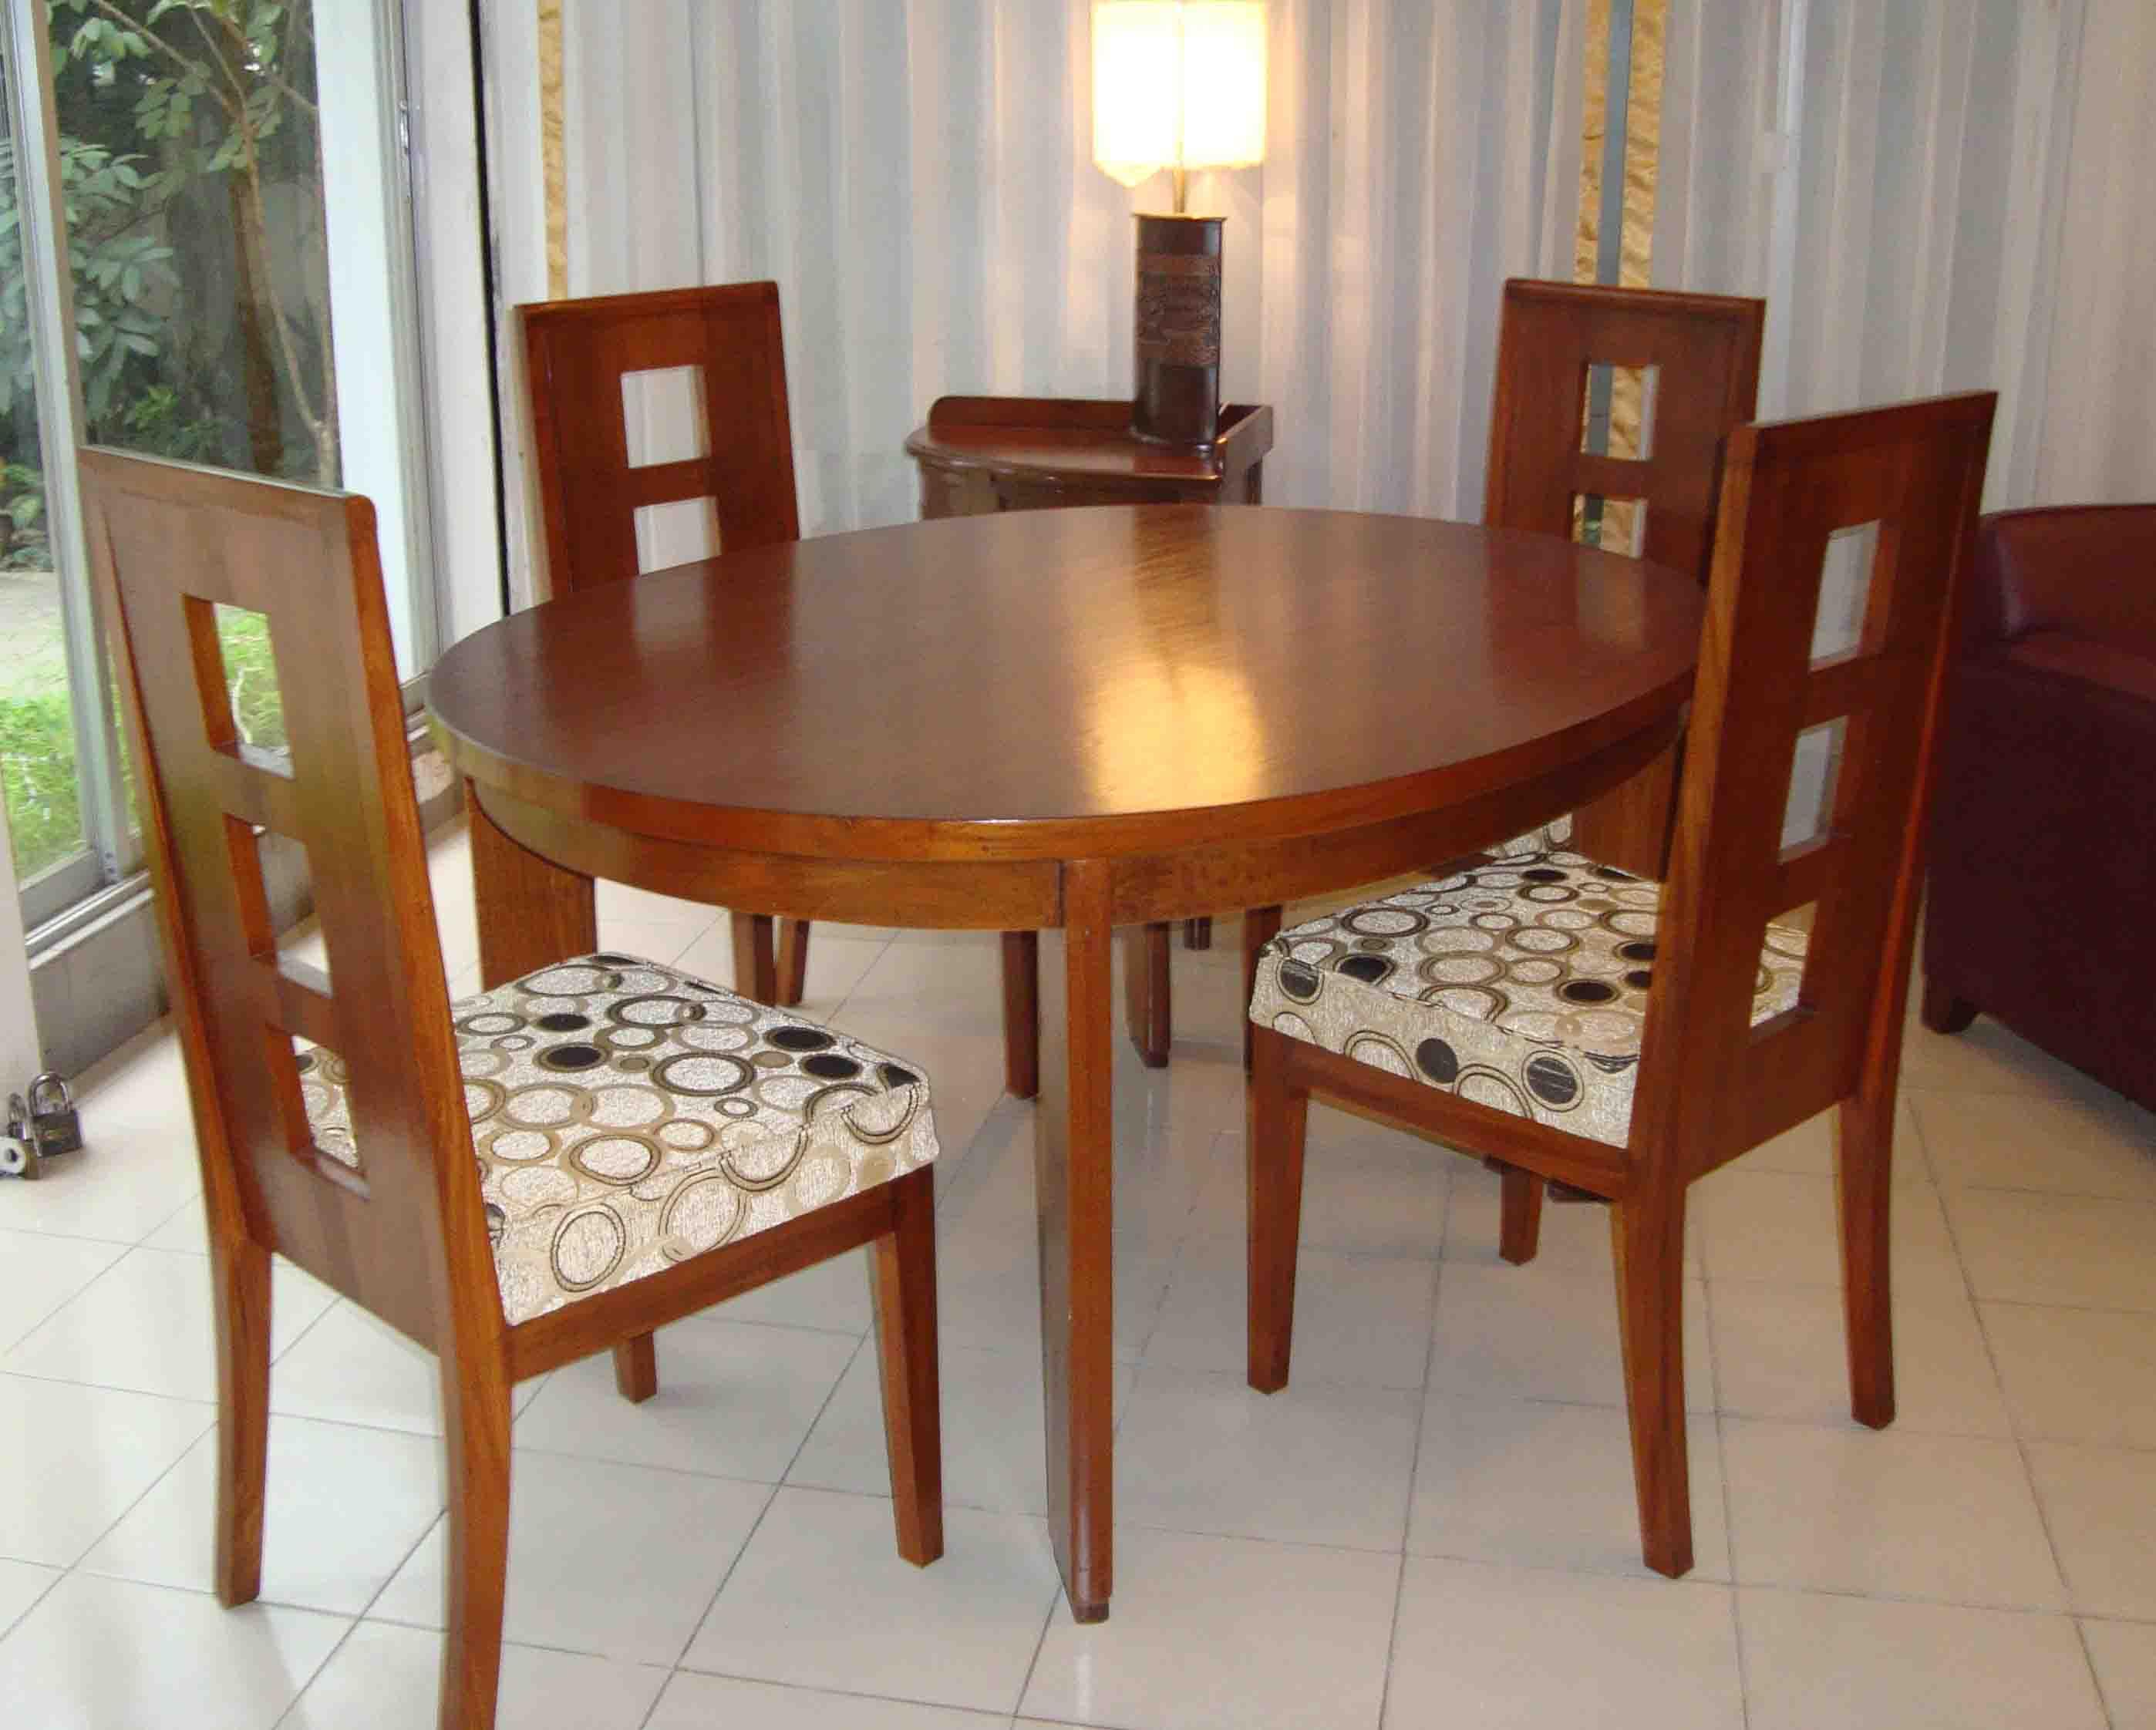 Best Picture Restaurant Chair Price In Bd